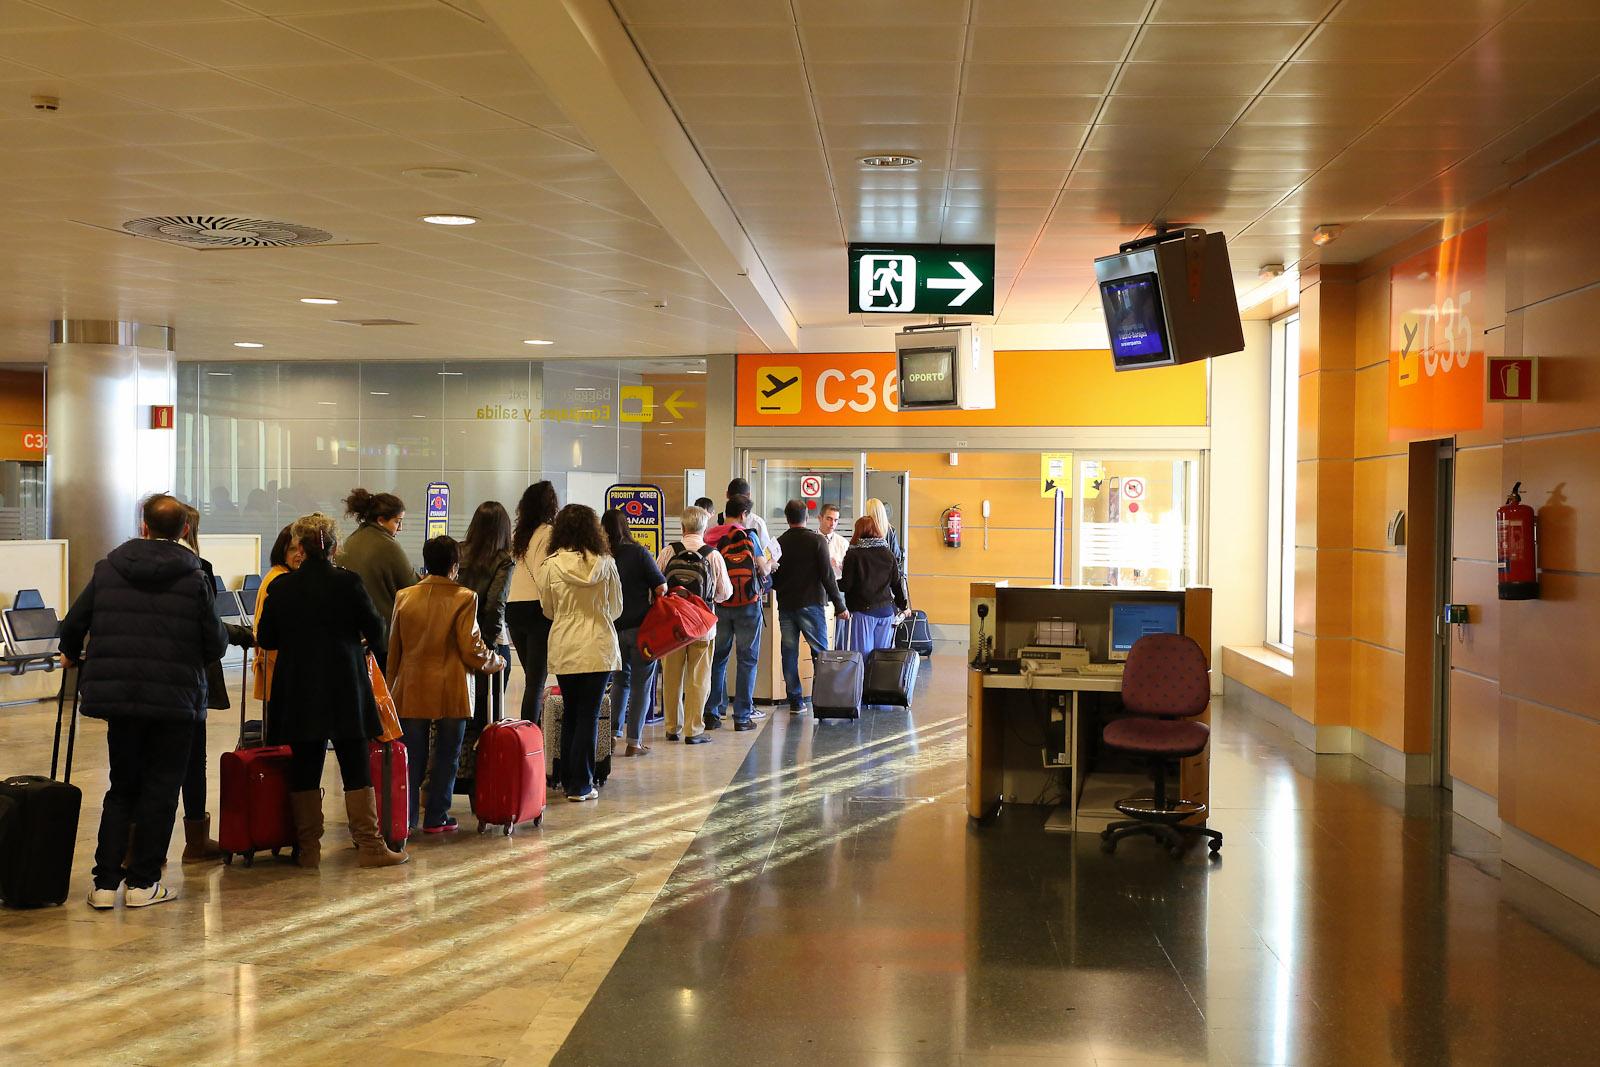 Посадка на рейс Ryanair в аэропорту Барахас